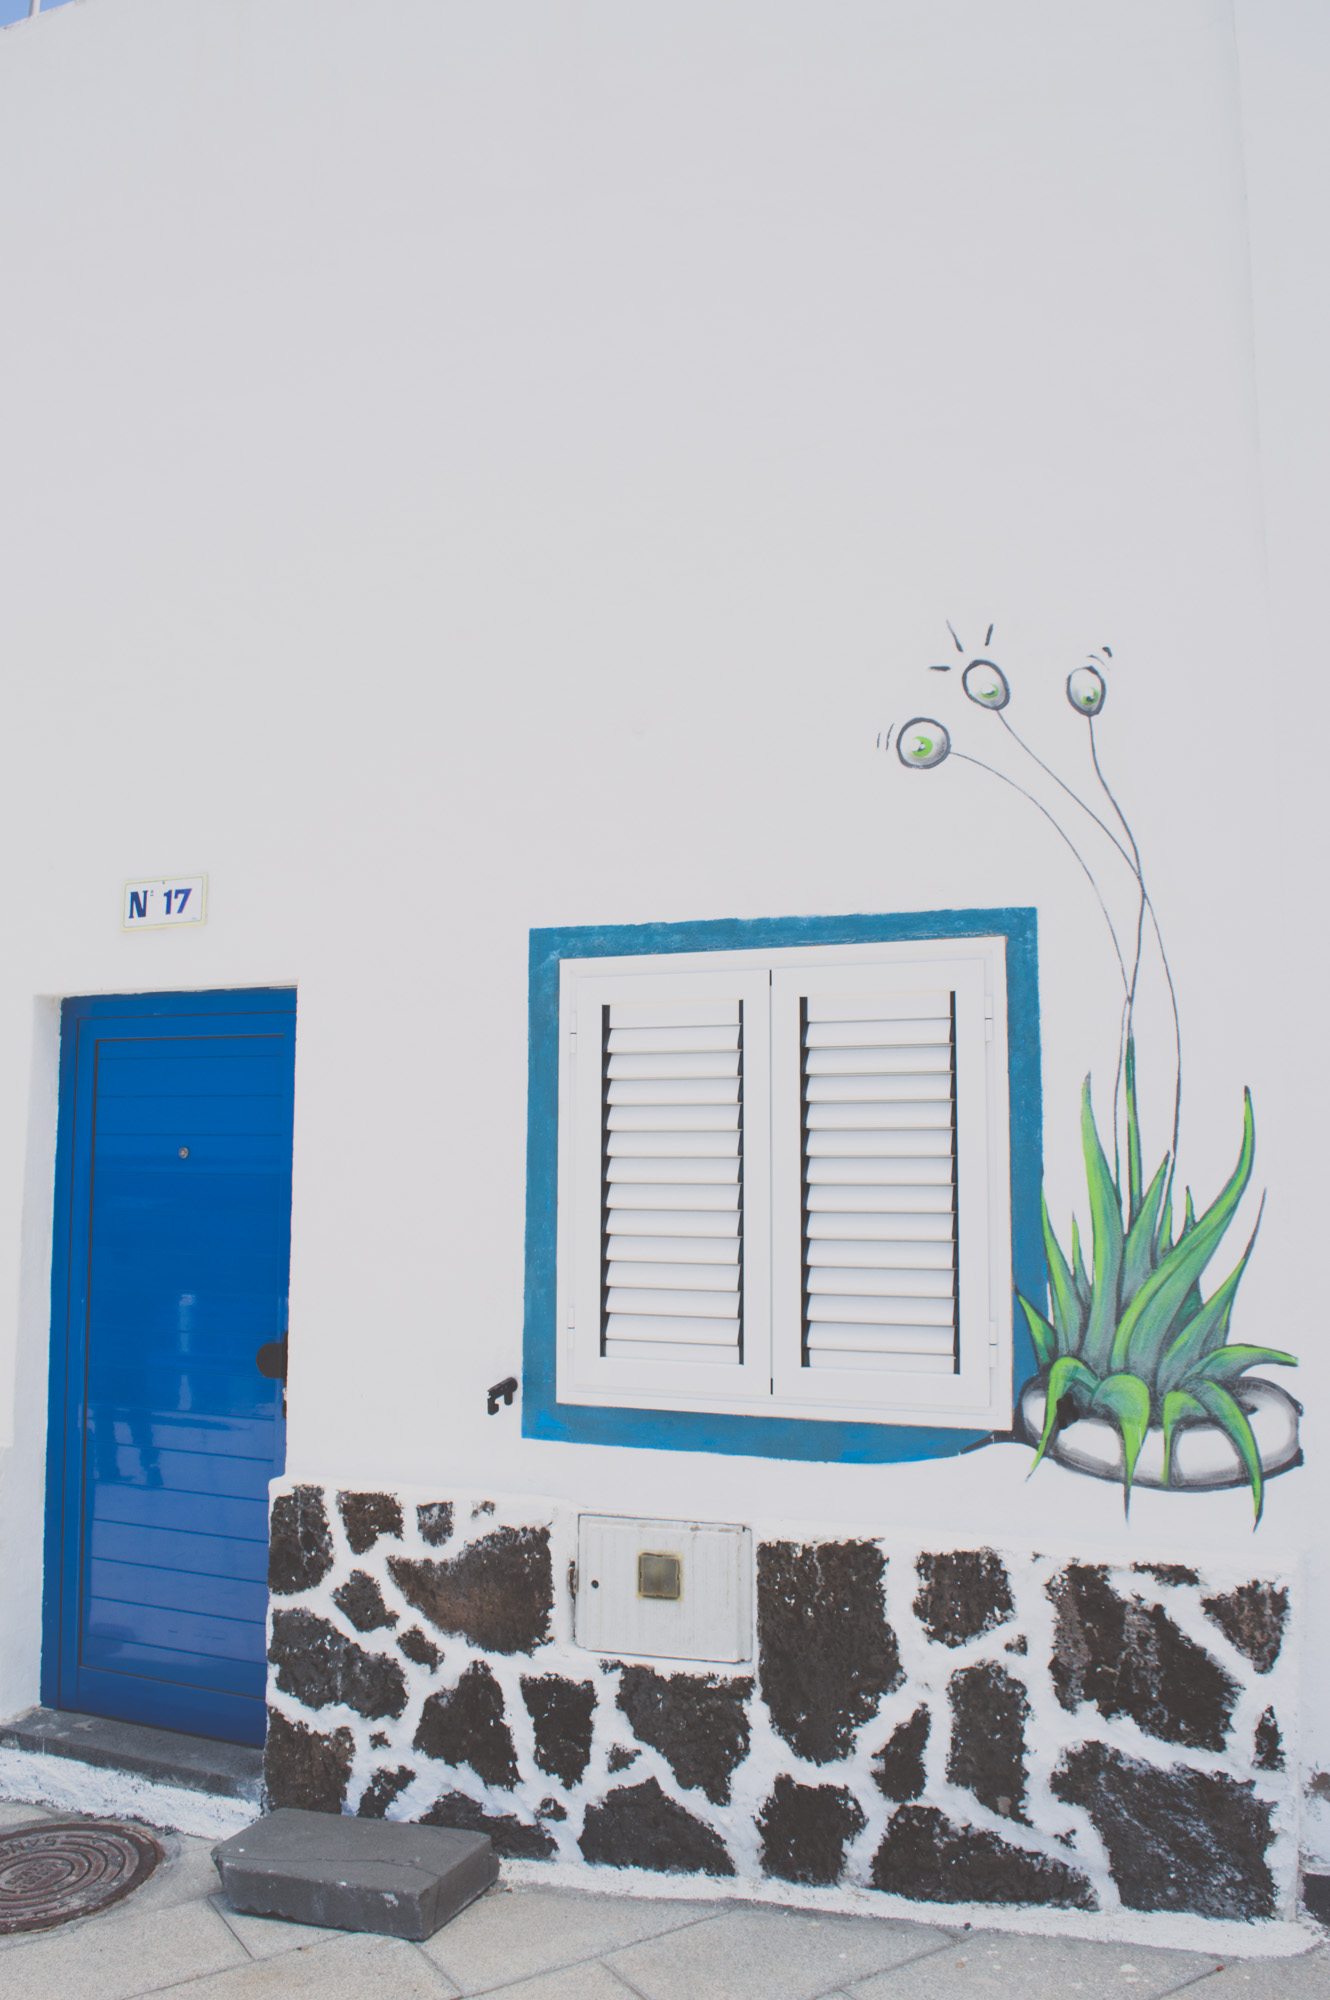 façade de Maison Blanche à porte bleue